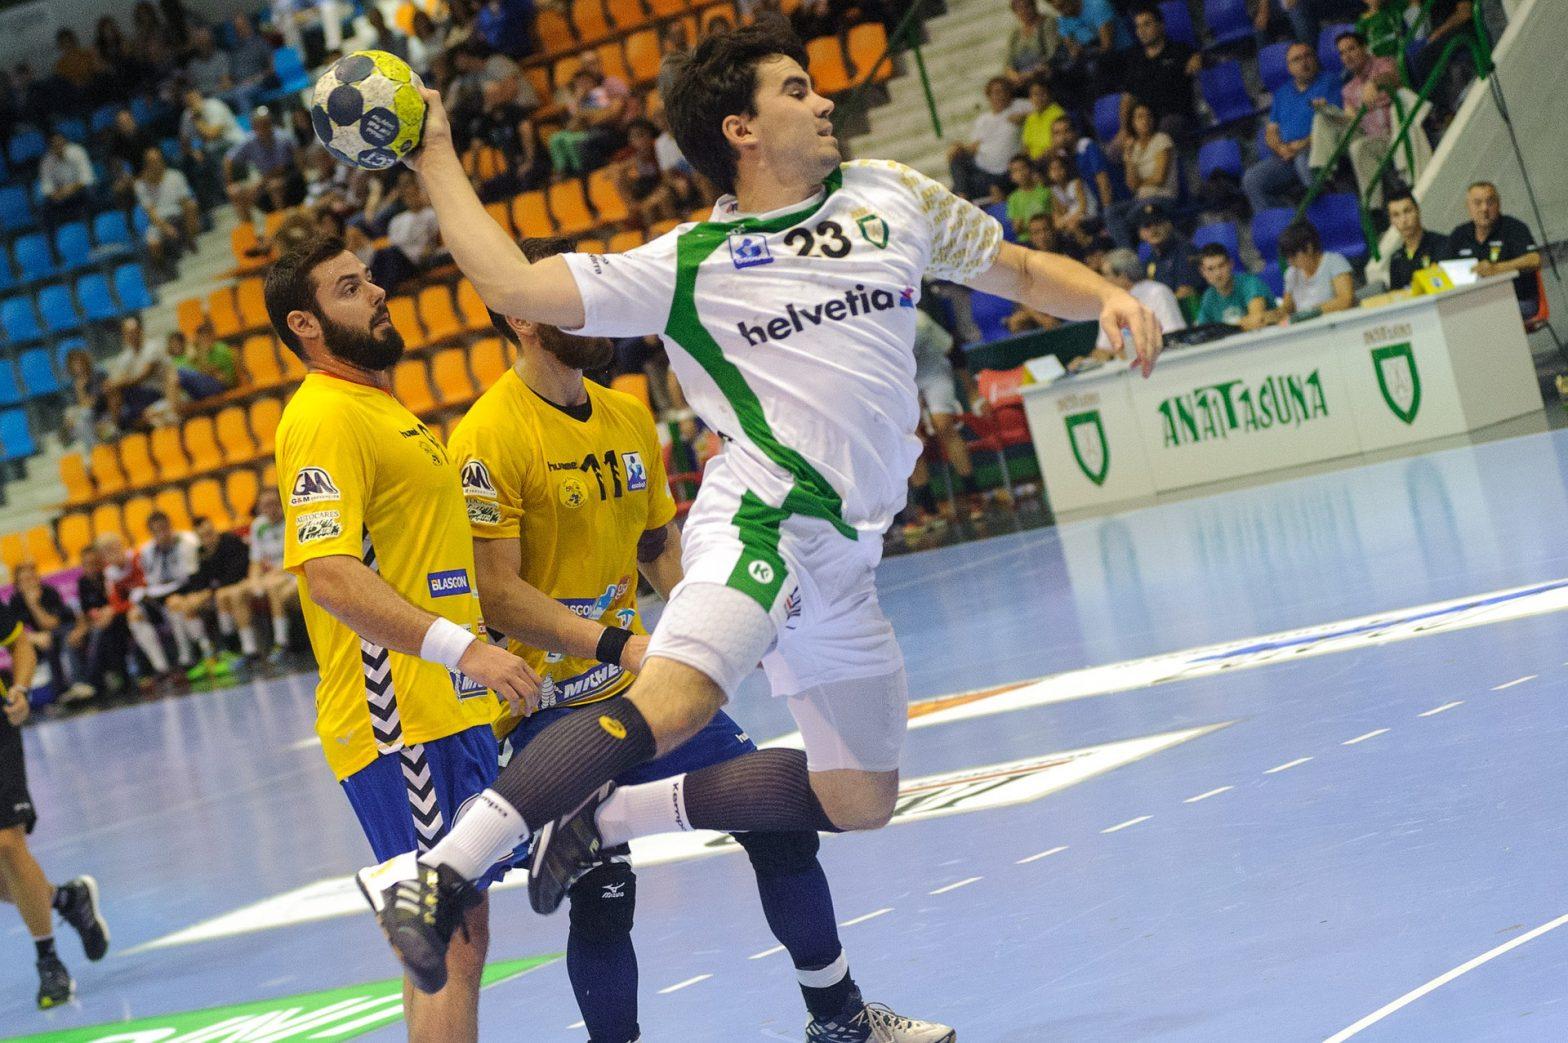 https://pixabay.com/de/sport-handball-partei-ballon-2102960/